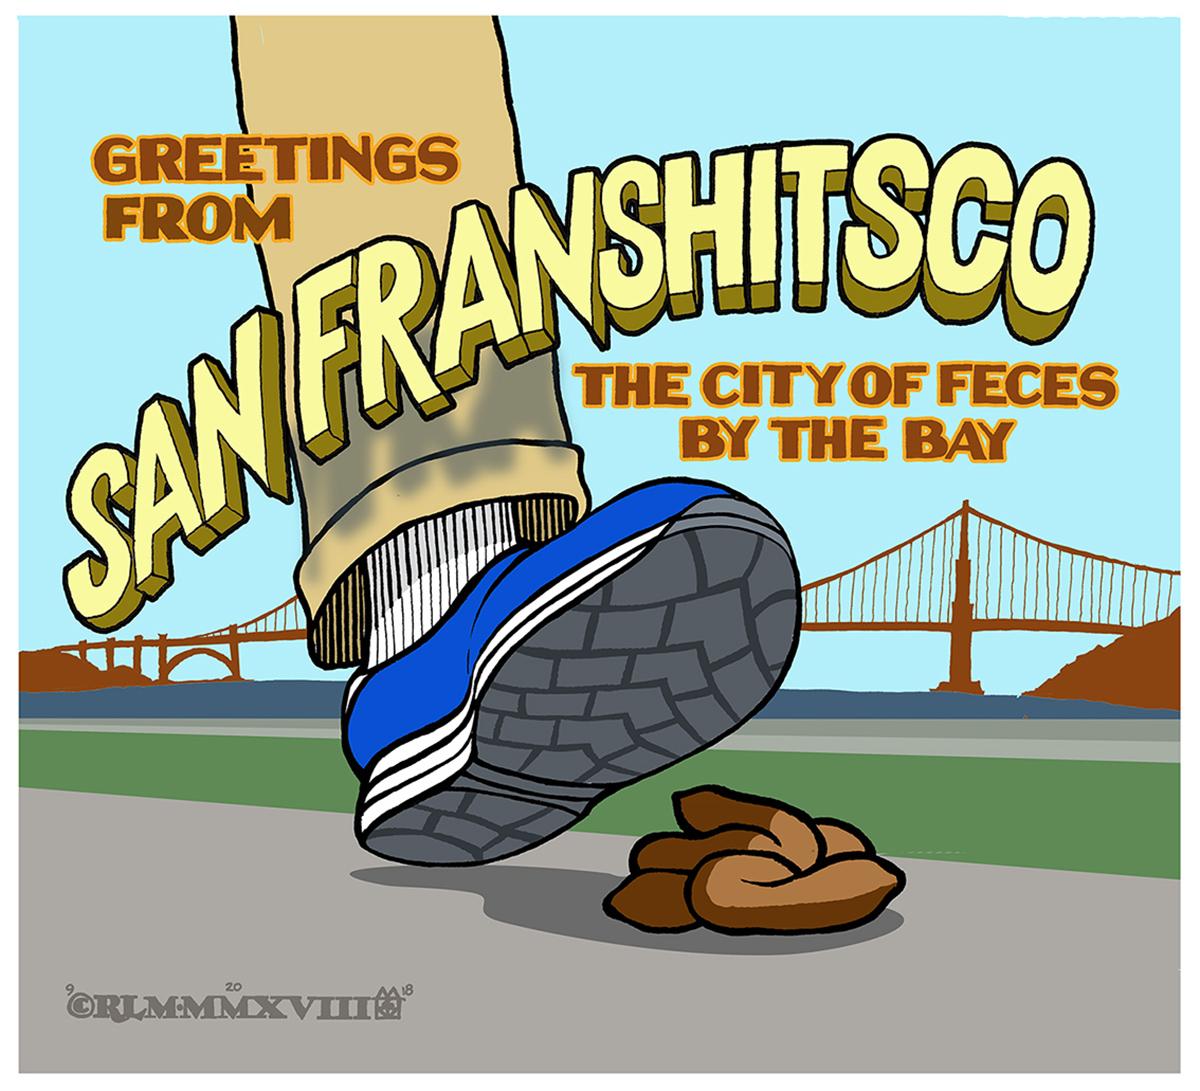 SAN FRANSHITSCO